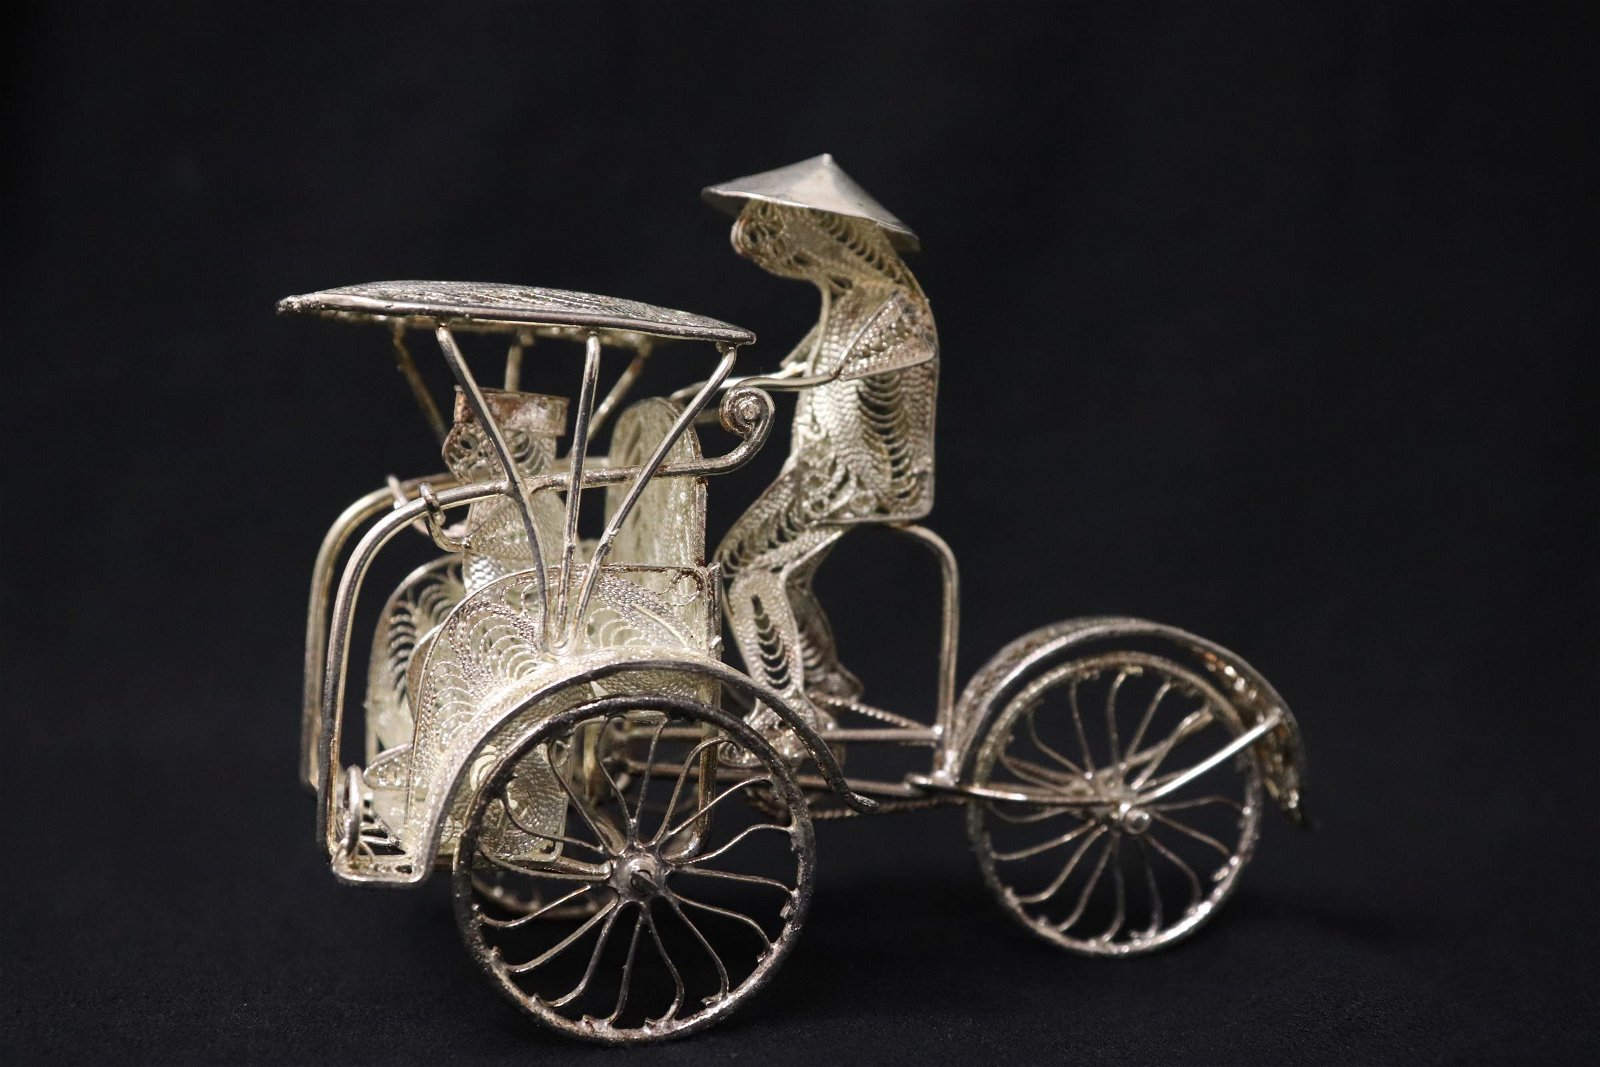 A silver like ornament